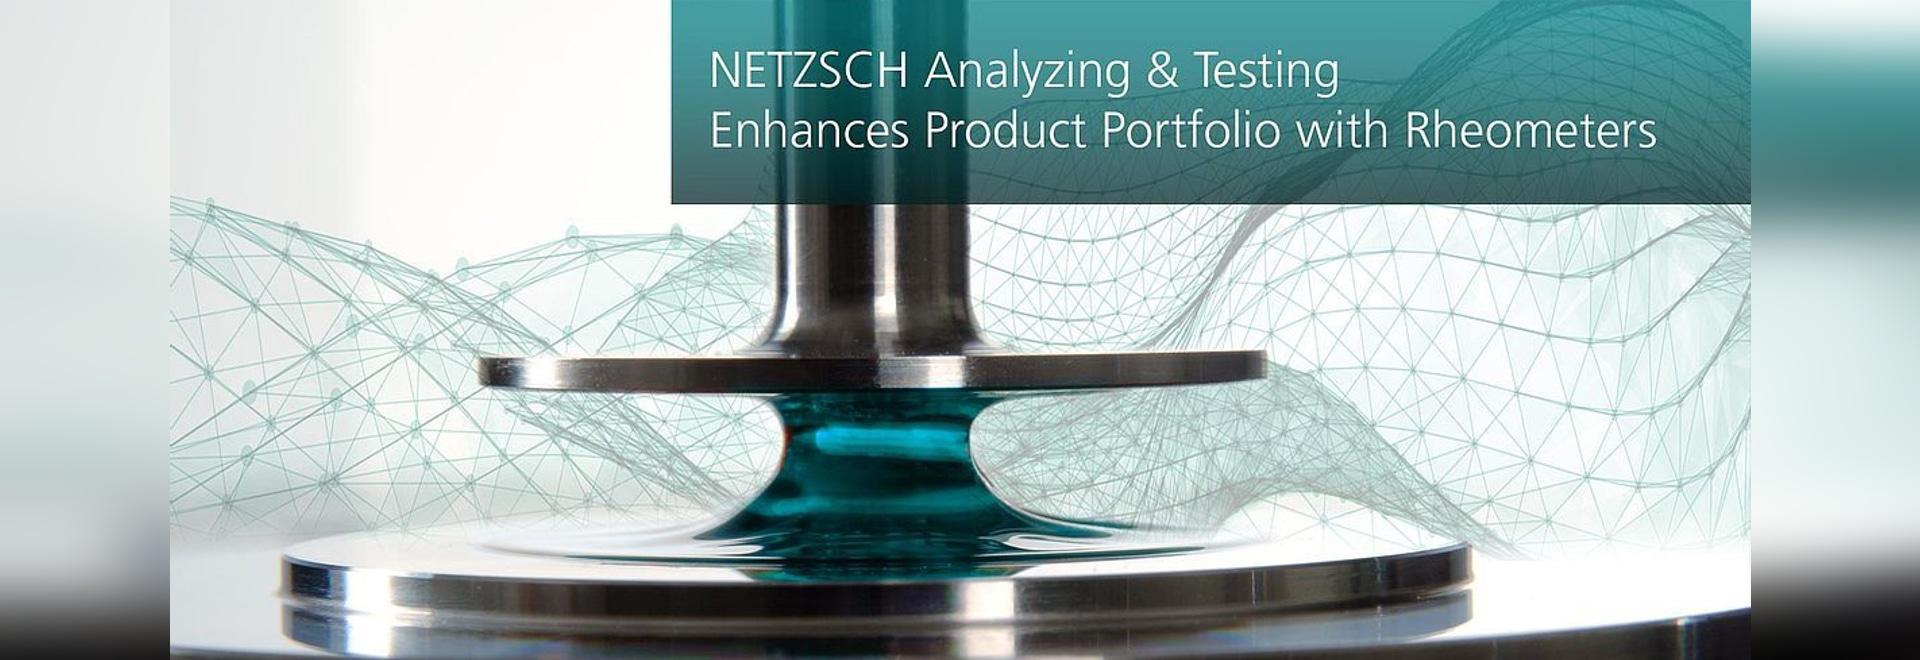 NETZSCH Analyzing & Testing enhances Product Portfolio with Rheometers